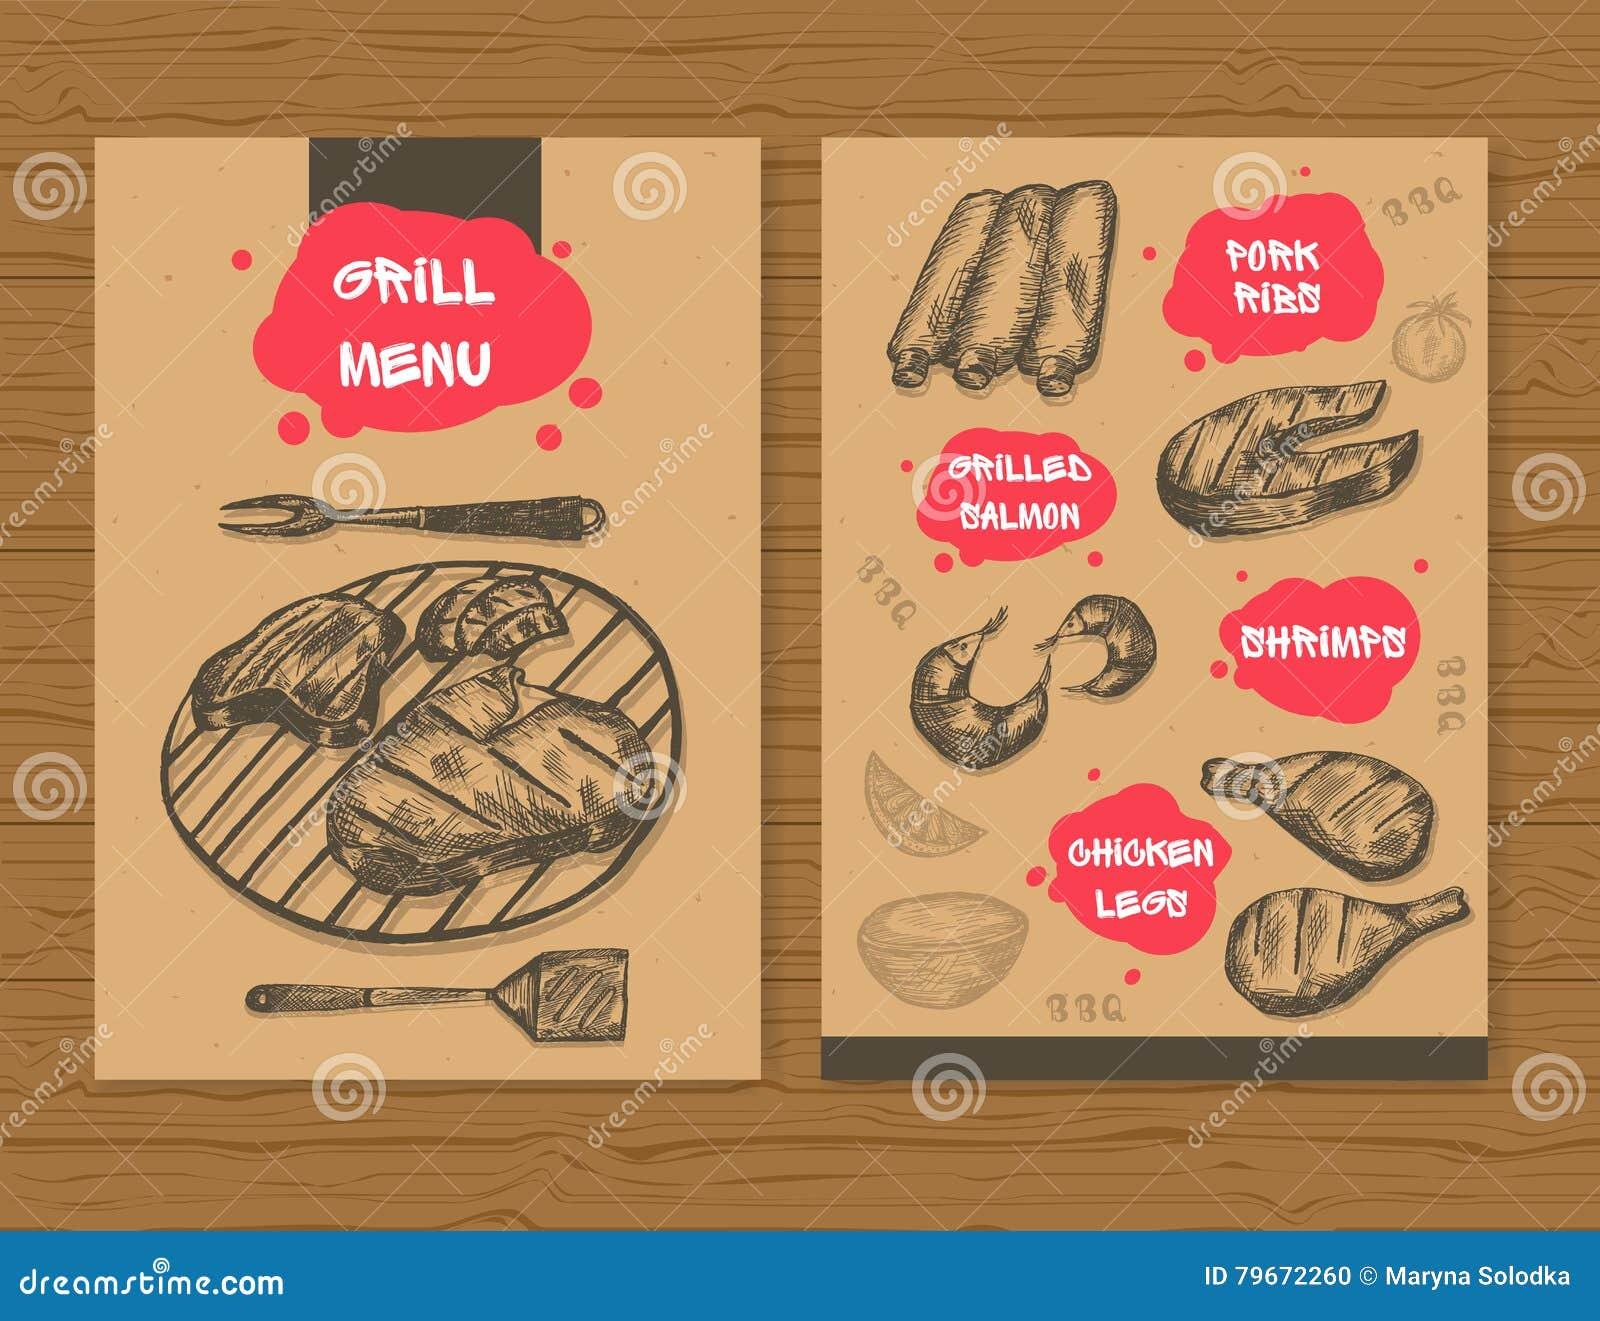 Grill Menu Template Ready Design Bbq Menu For Restaurant Bar Etc